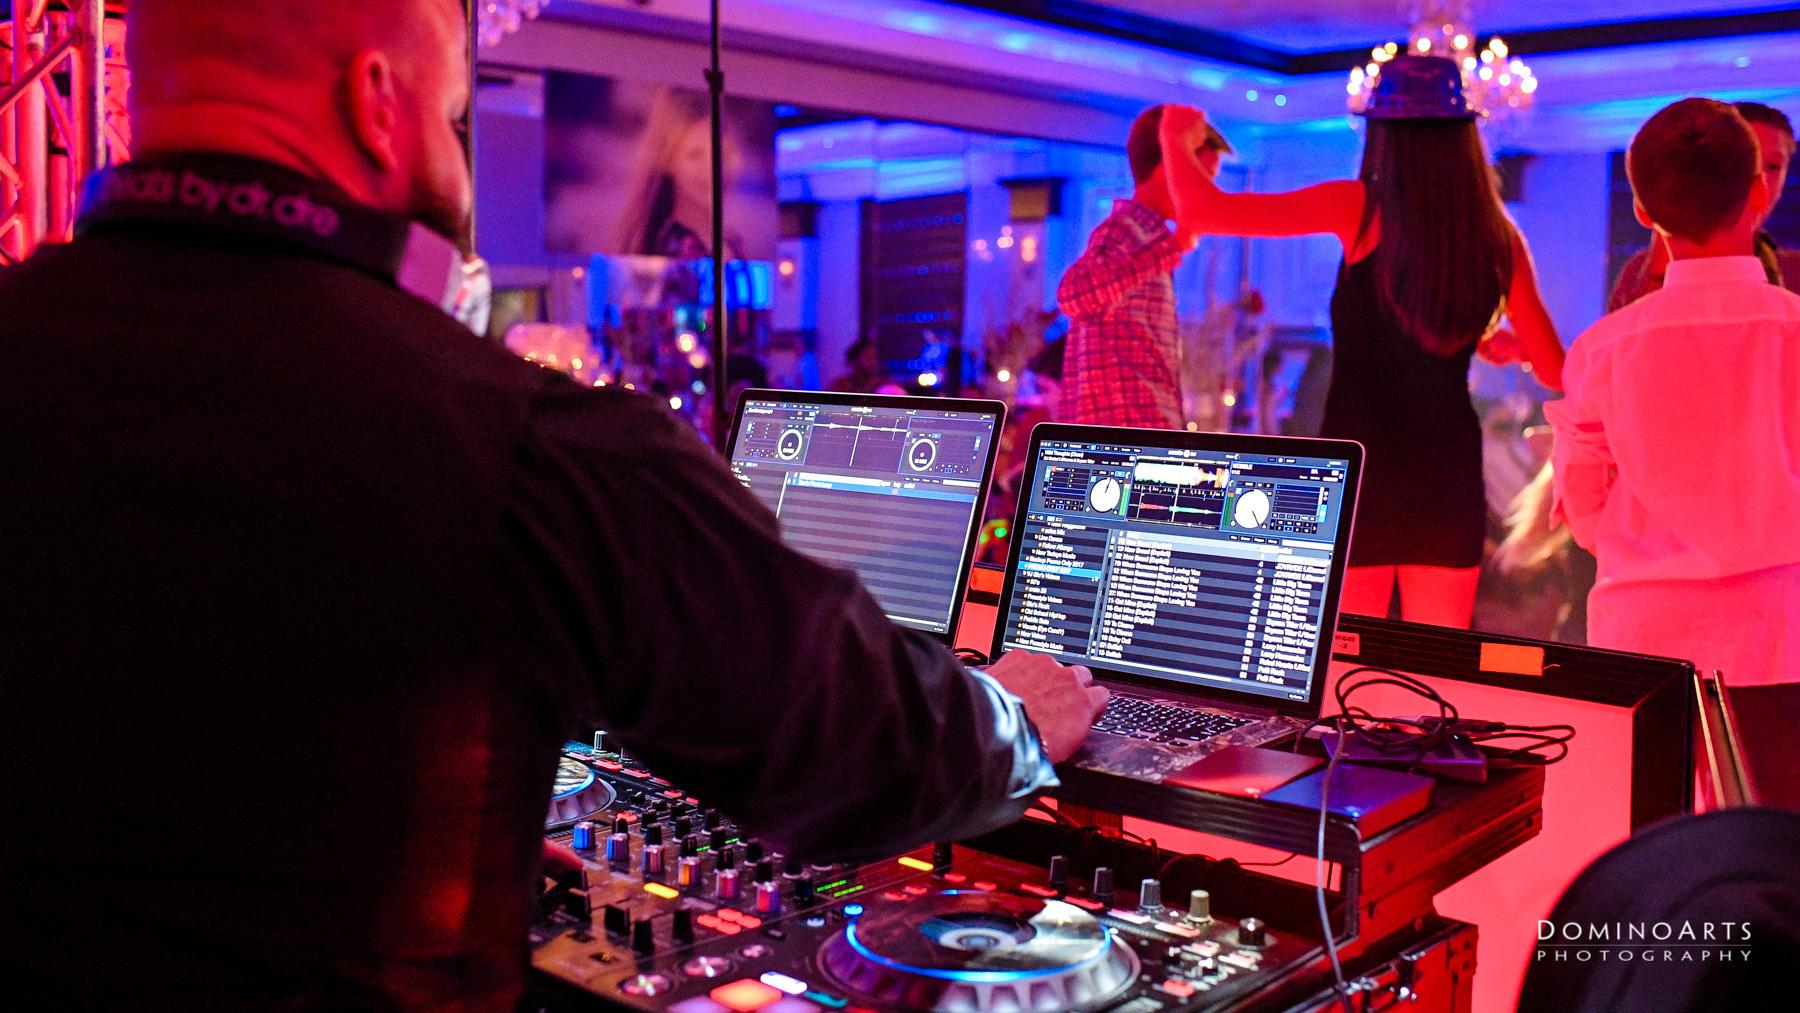 Fun DJ pictures at Temple Beth El Mitzvah, Boca Raton Mitzvah